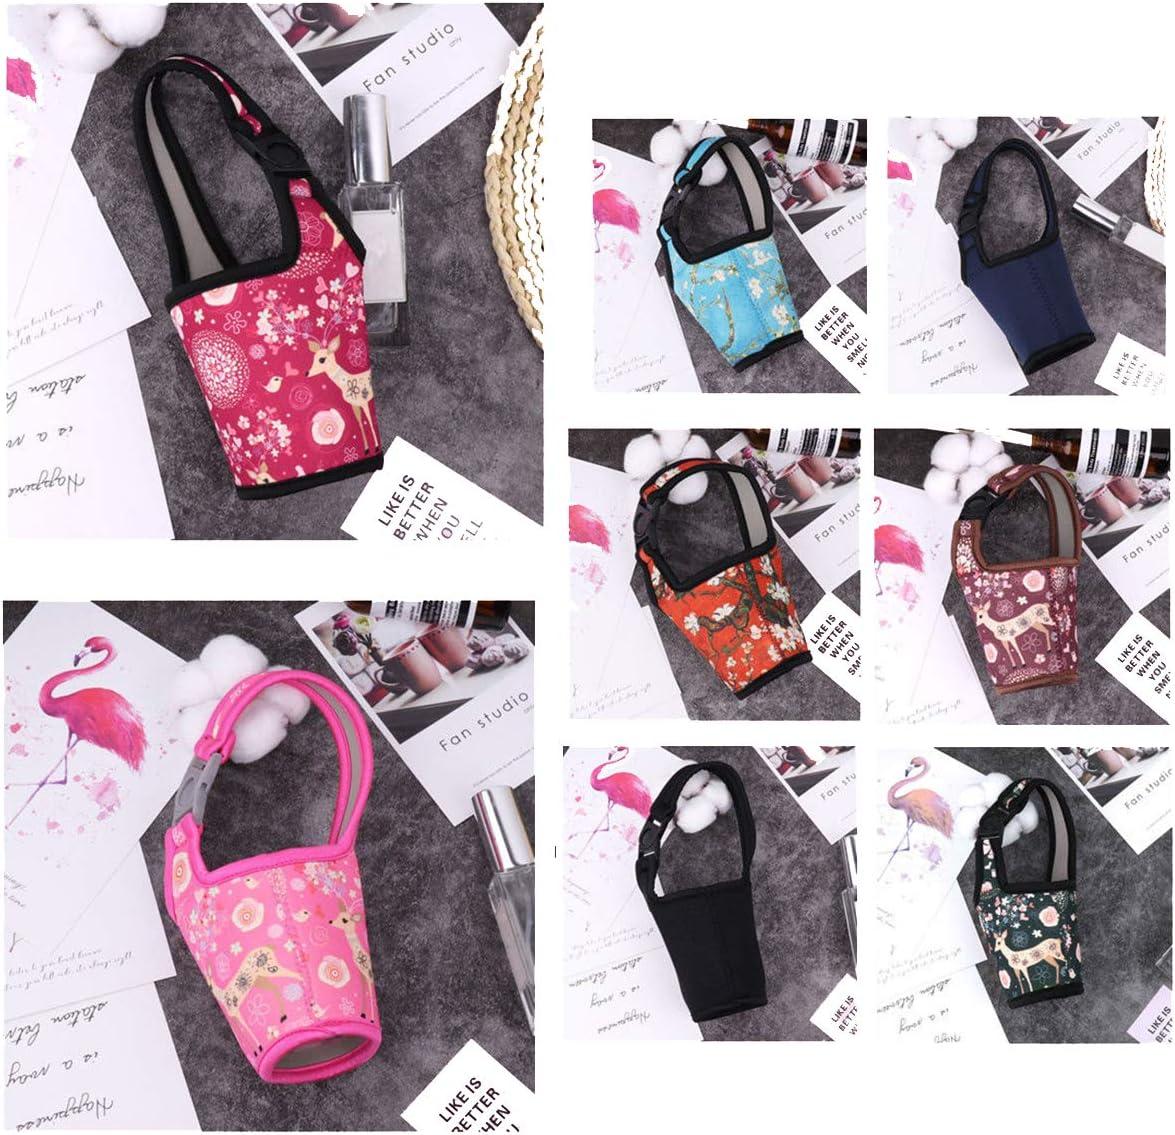 Baby Bottle Bag Milk Thermal Insulation Antiscald Cover Holder Keep Warm Storage Blue Kimnny Bag